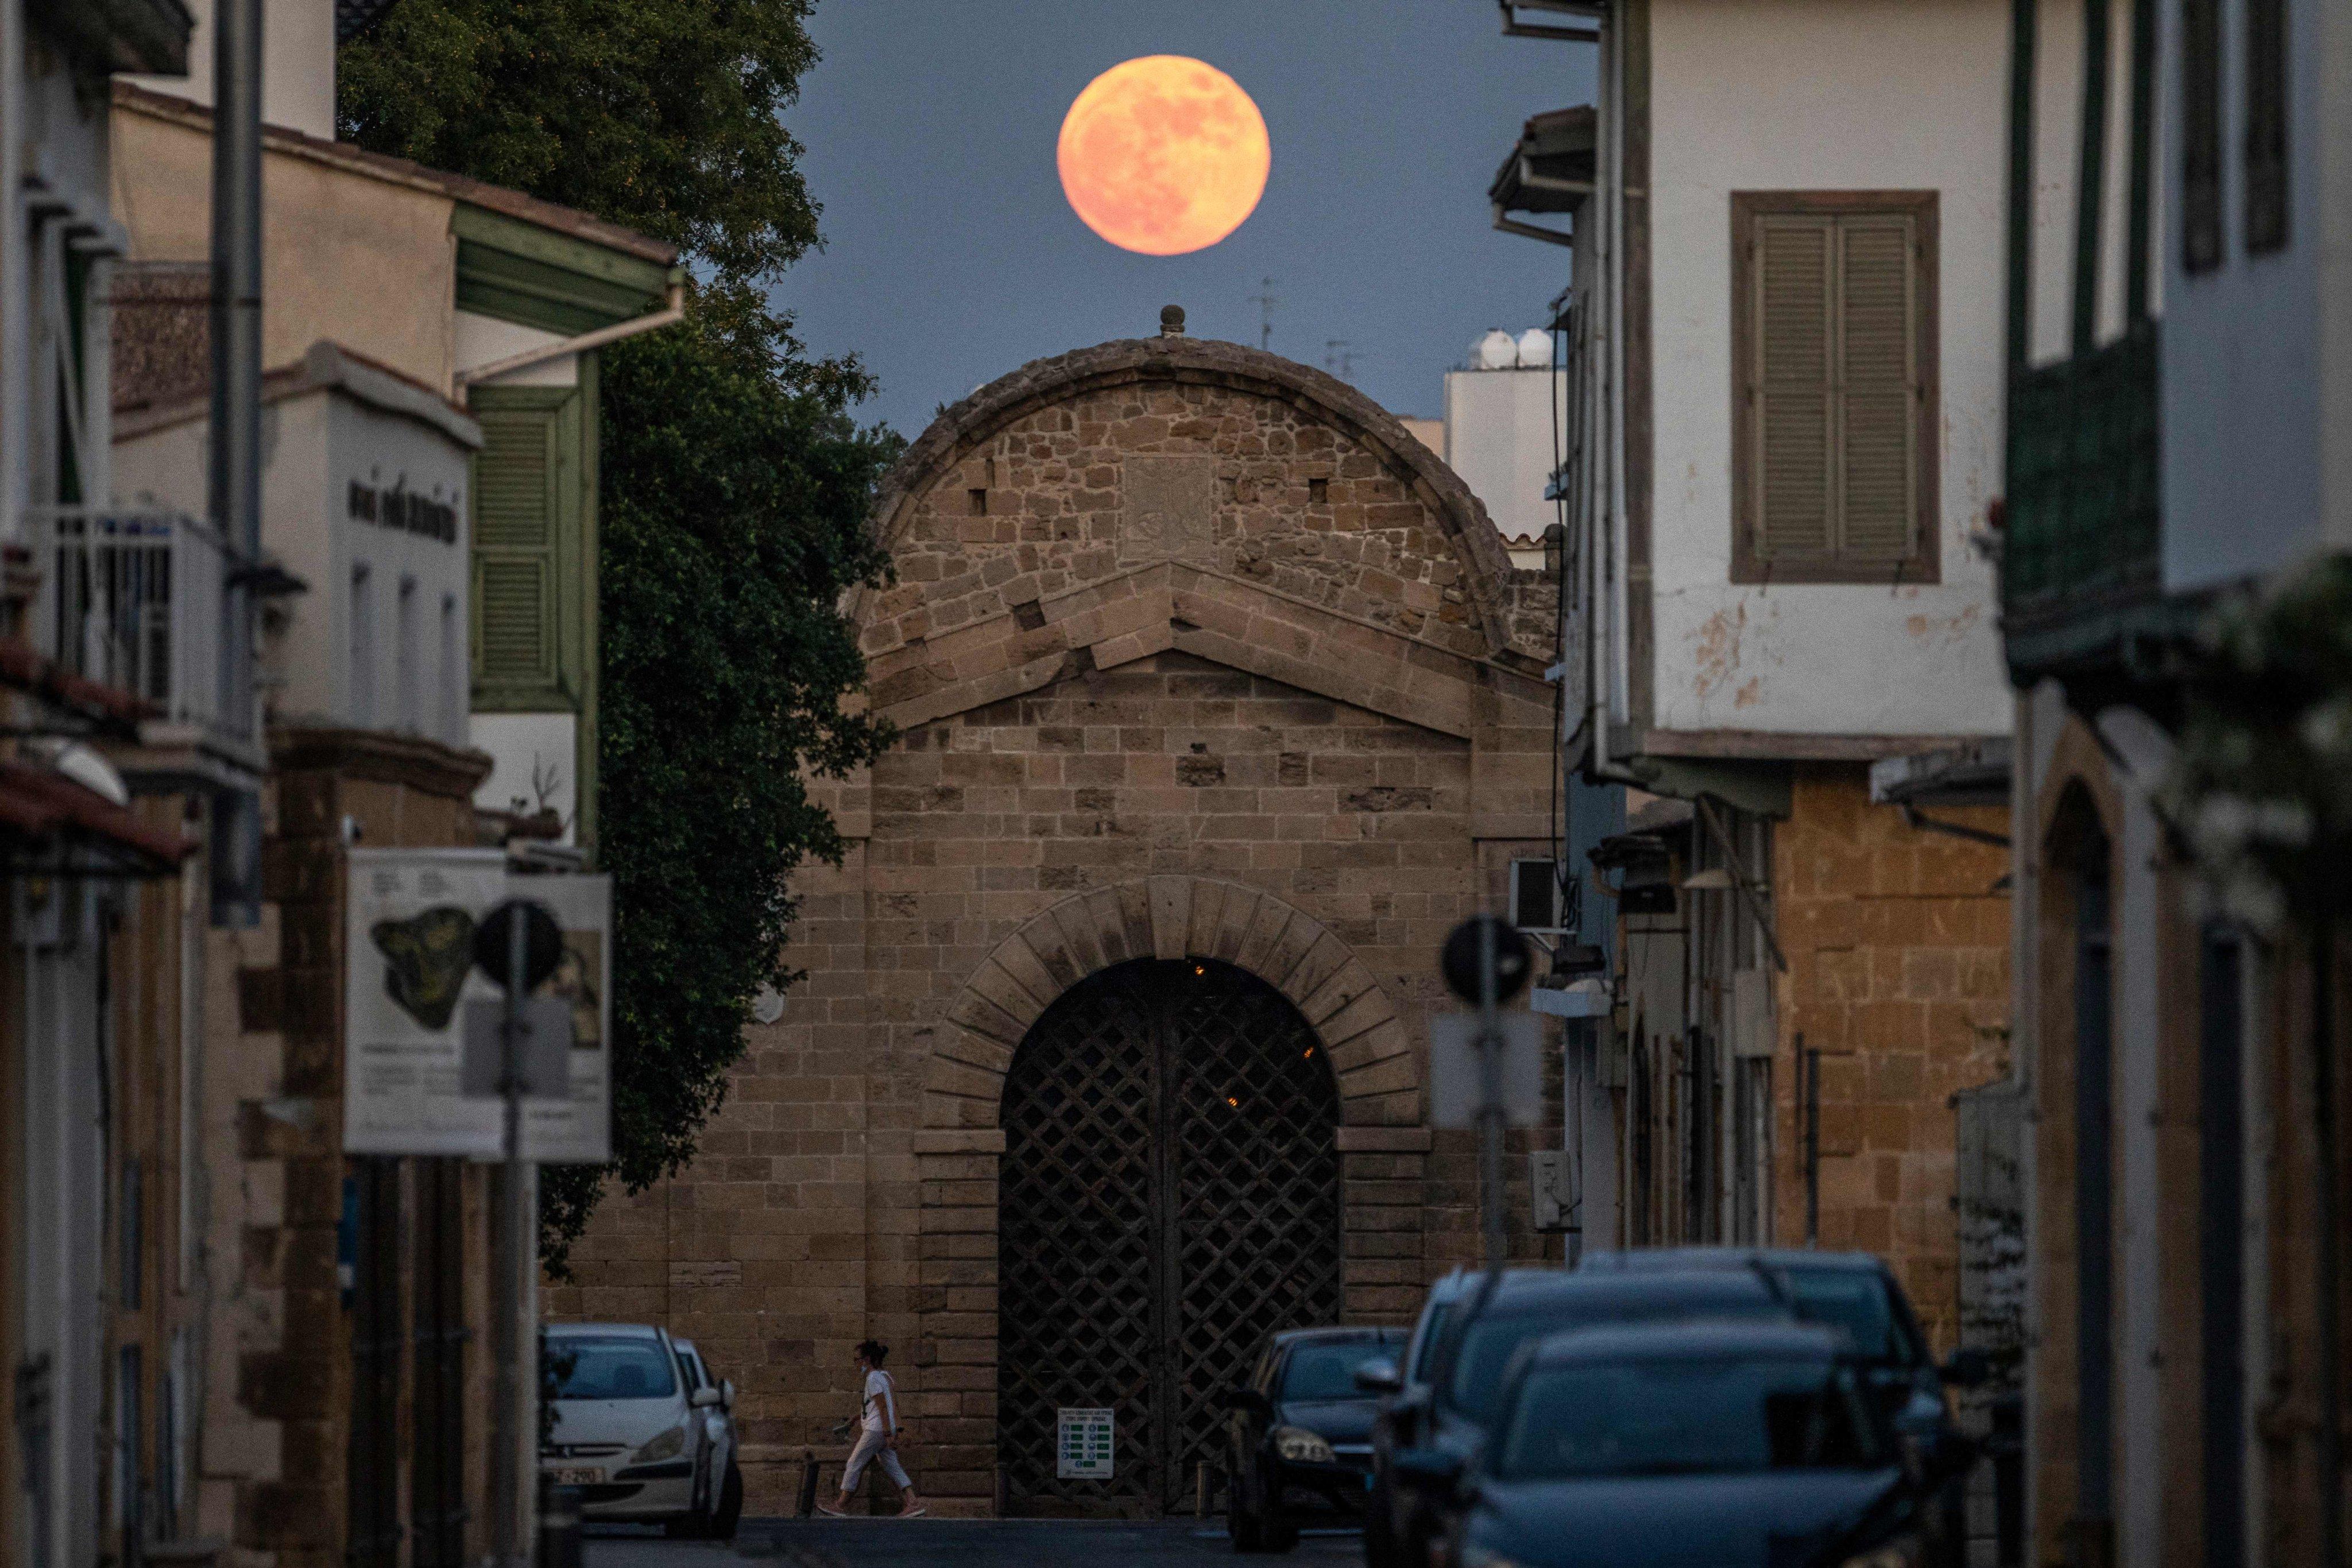 CYPRUS-ASTRONOMY-MOON